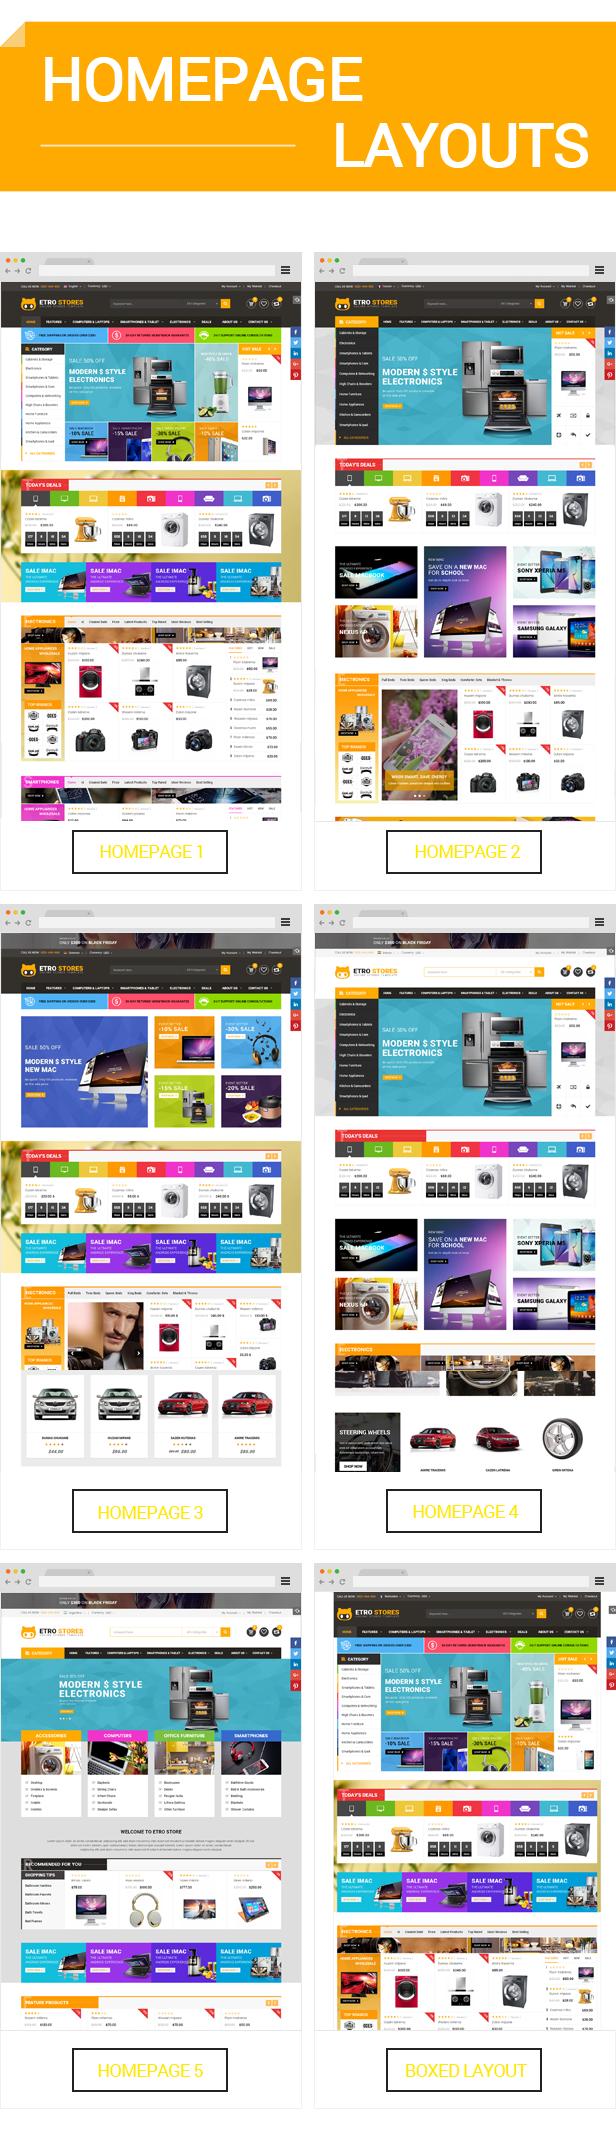 Etrostore - Homepage